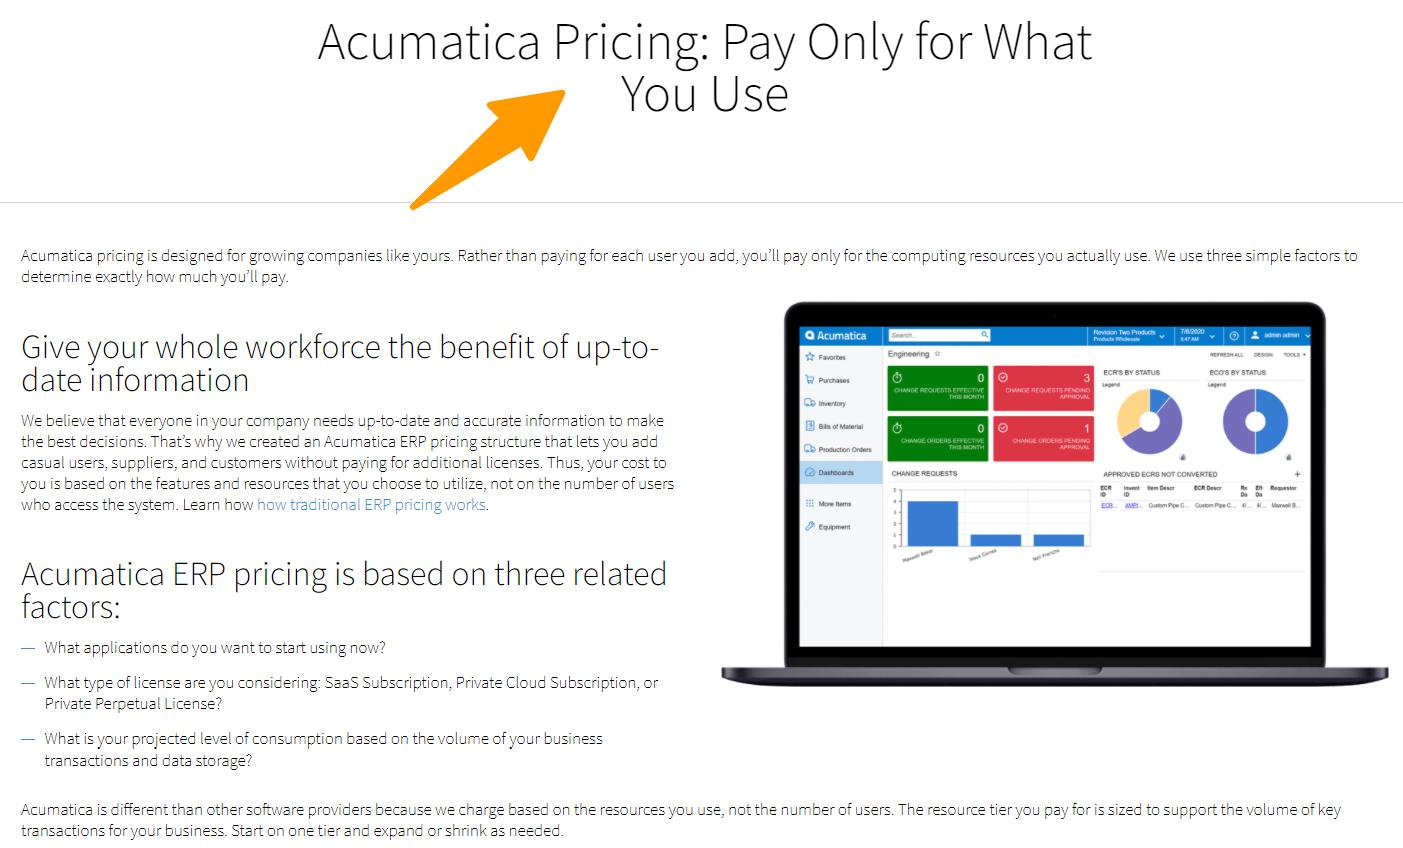 Acumatica-Pricing-